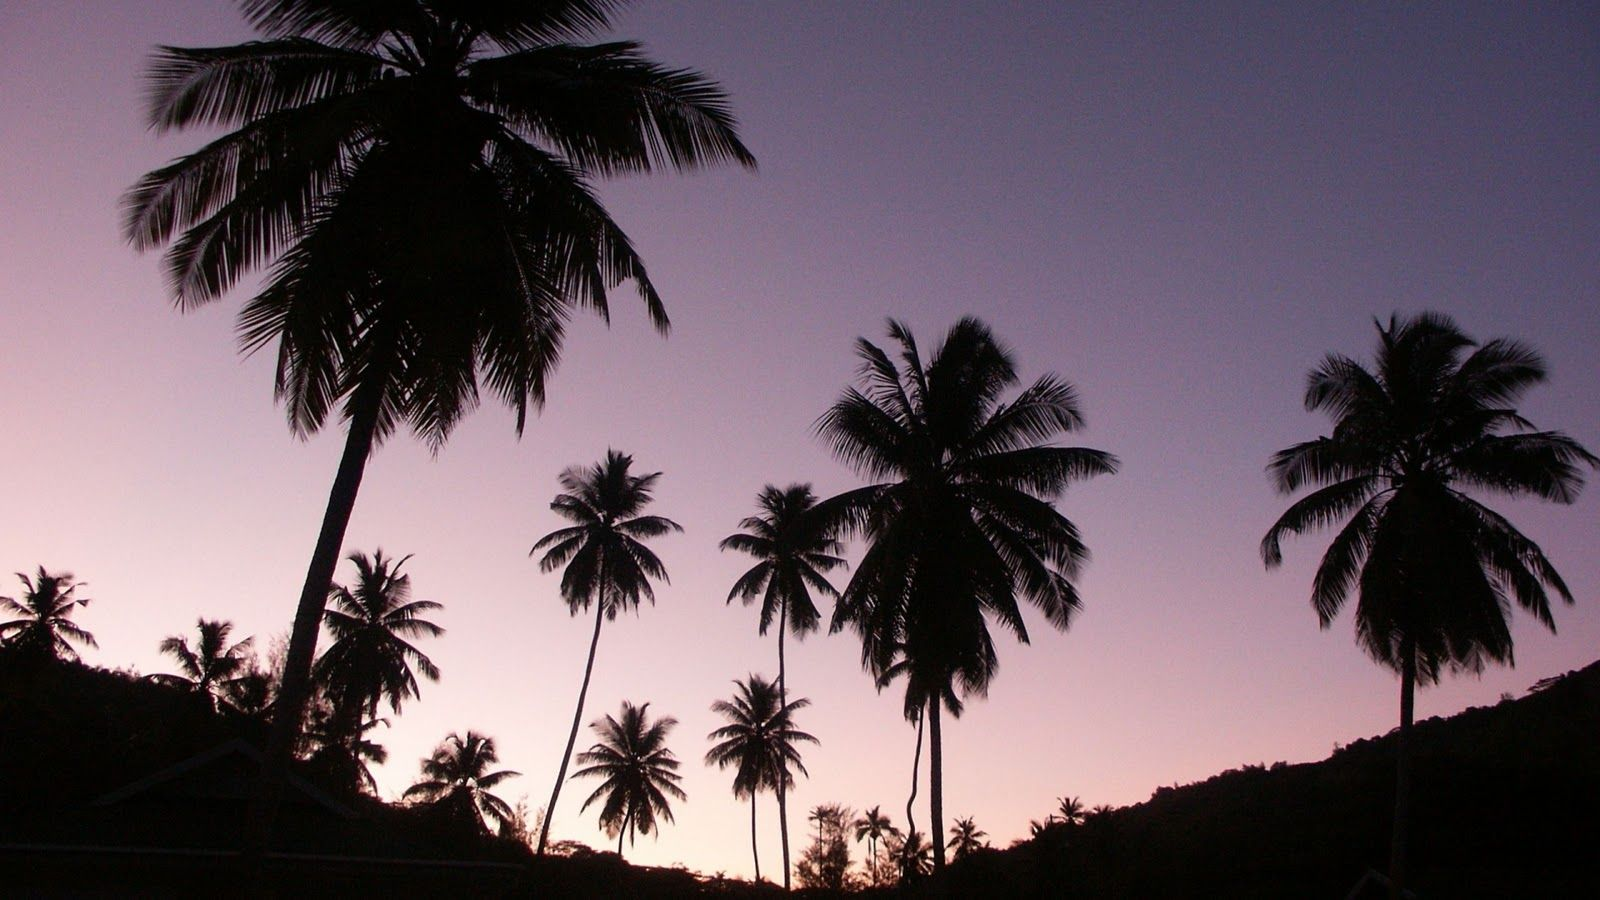 Blackpalmtreesilhouettes Jpg 1 600 900 Pixels Palm Trees Wallpaper Desktop Wallpapers Tumblr Tree Desktop Wallpaper